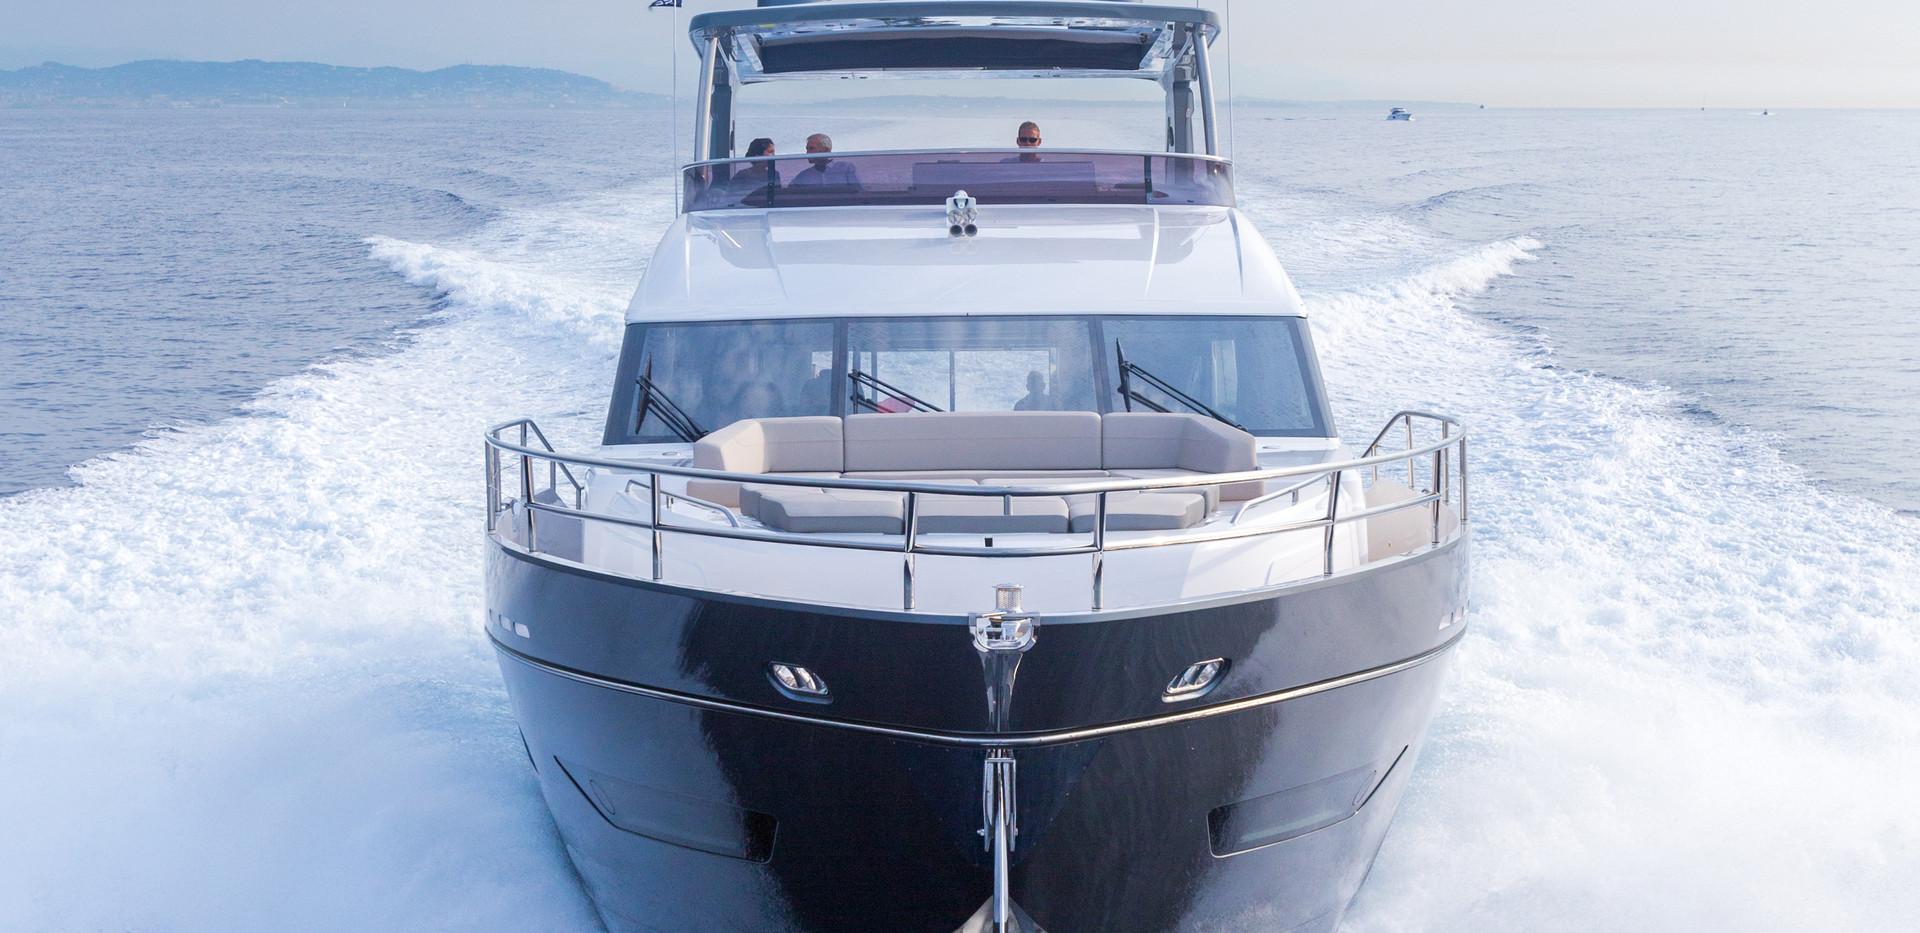 75-motor-yacht-exterior-grey-hull-12Abro